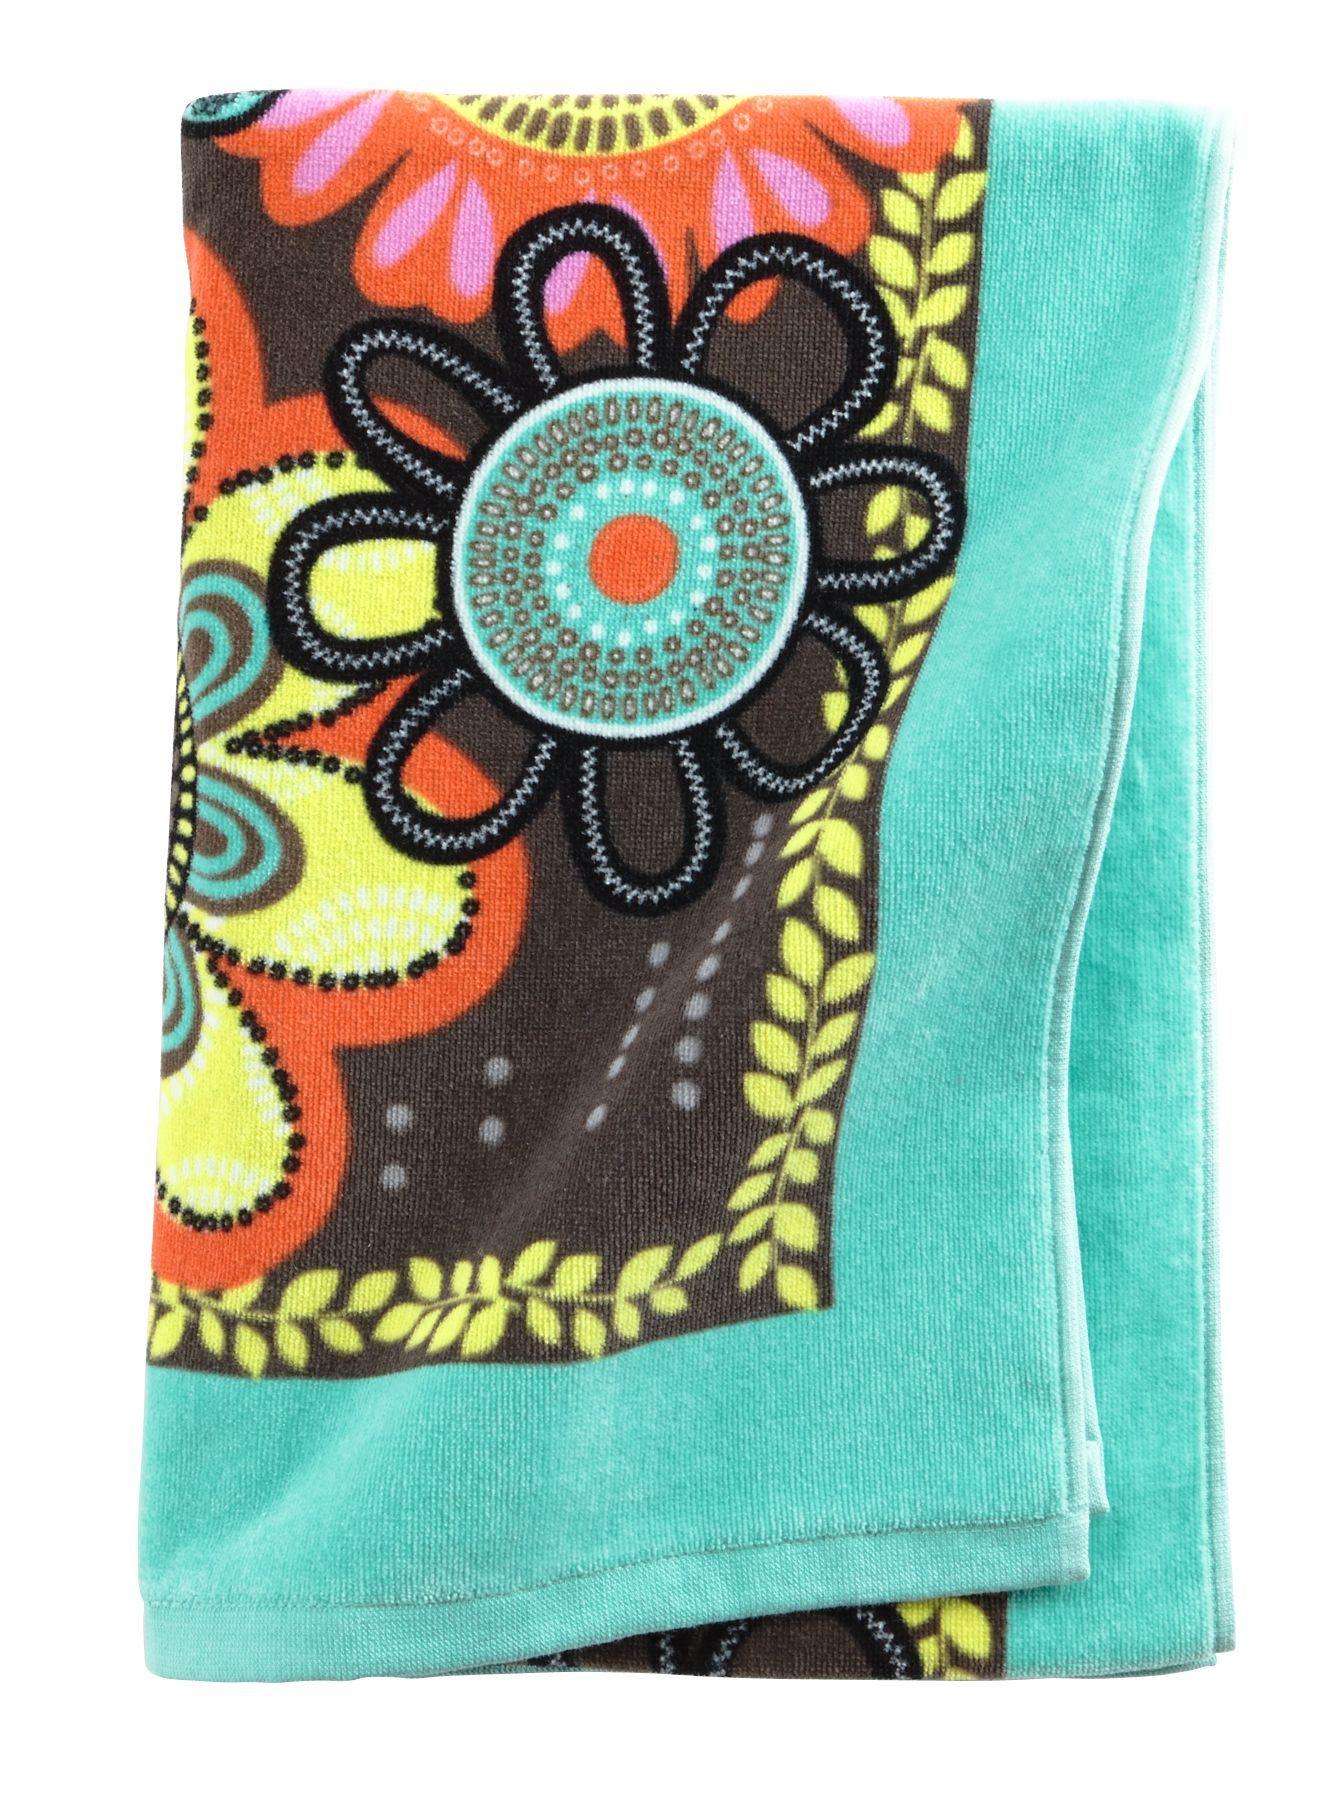 vera bradley beach towel in flower shower 50 off sale - Beach Towels On Sale